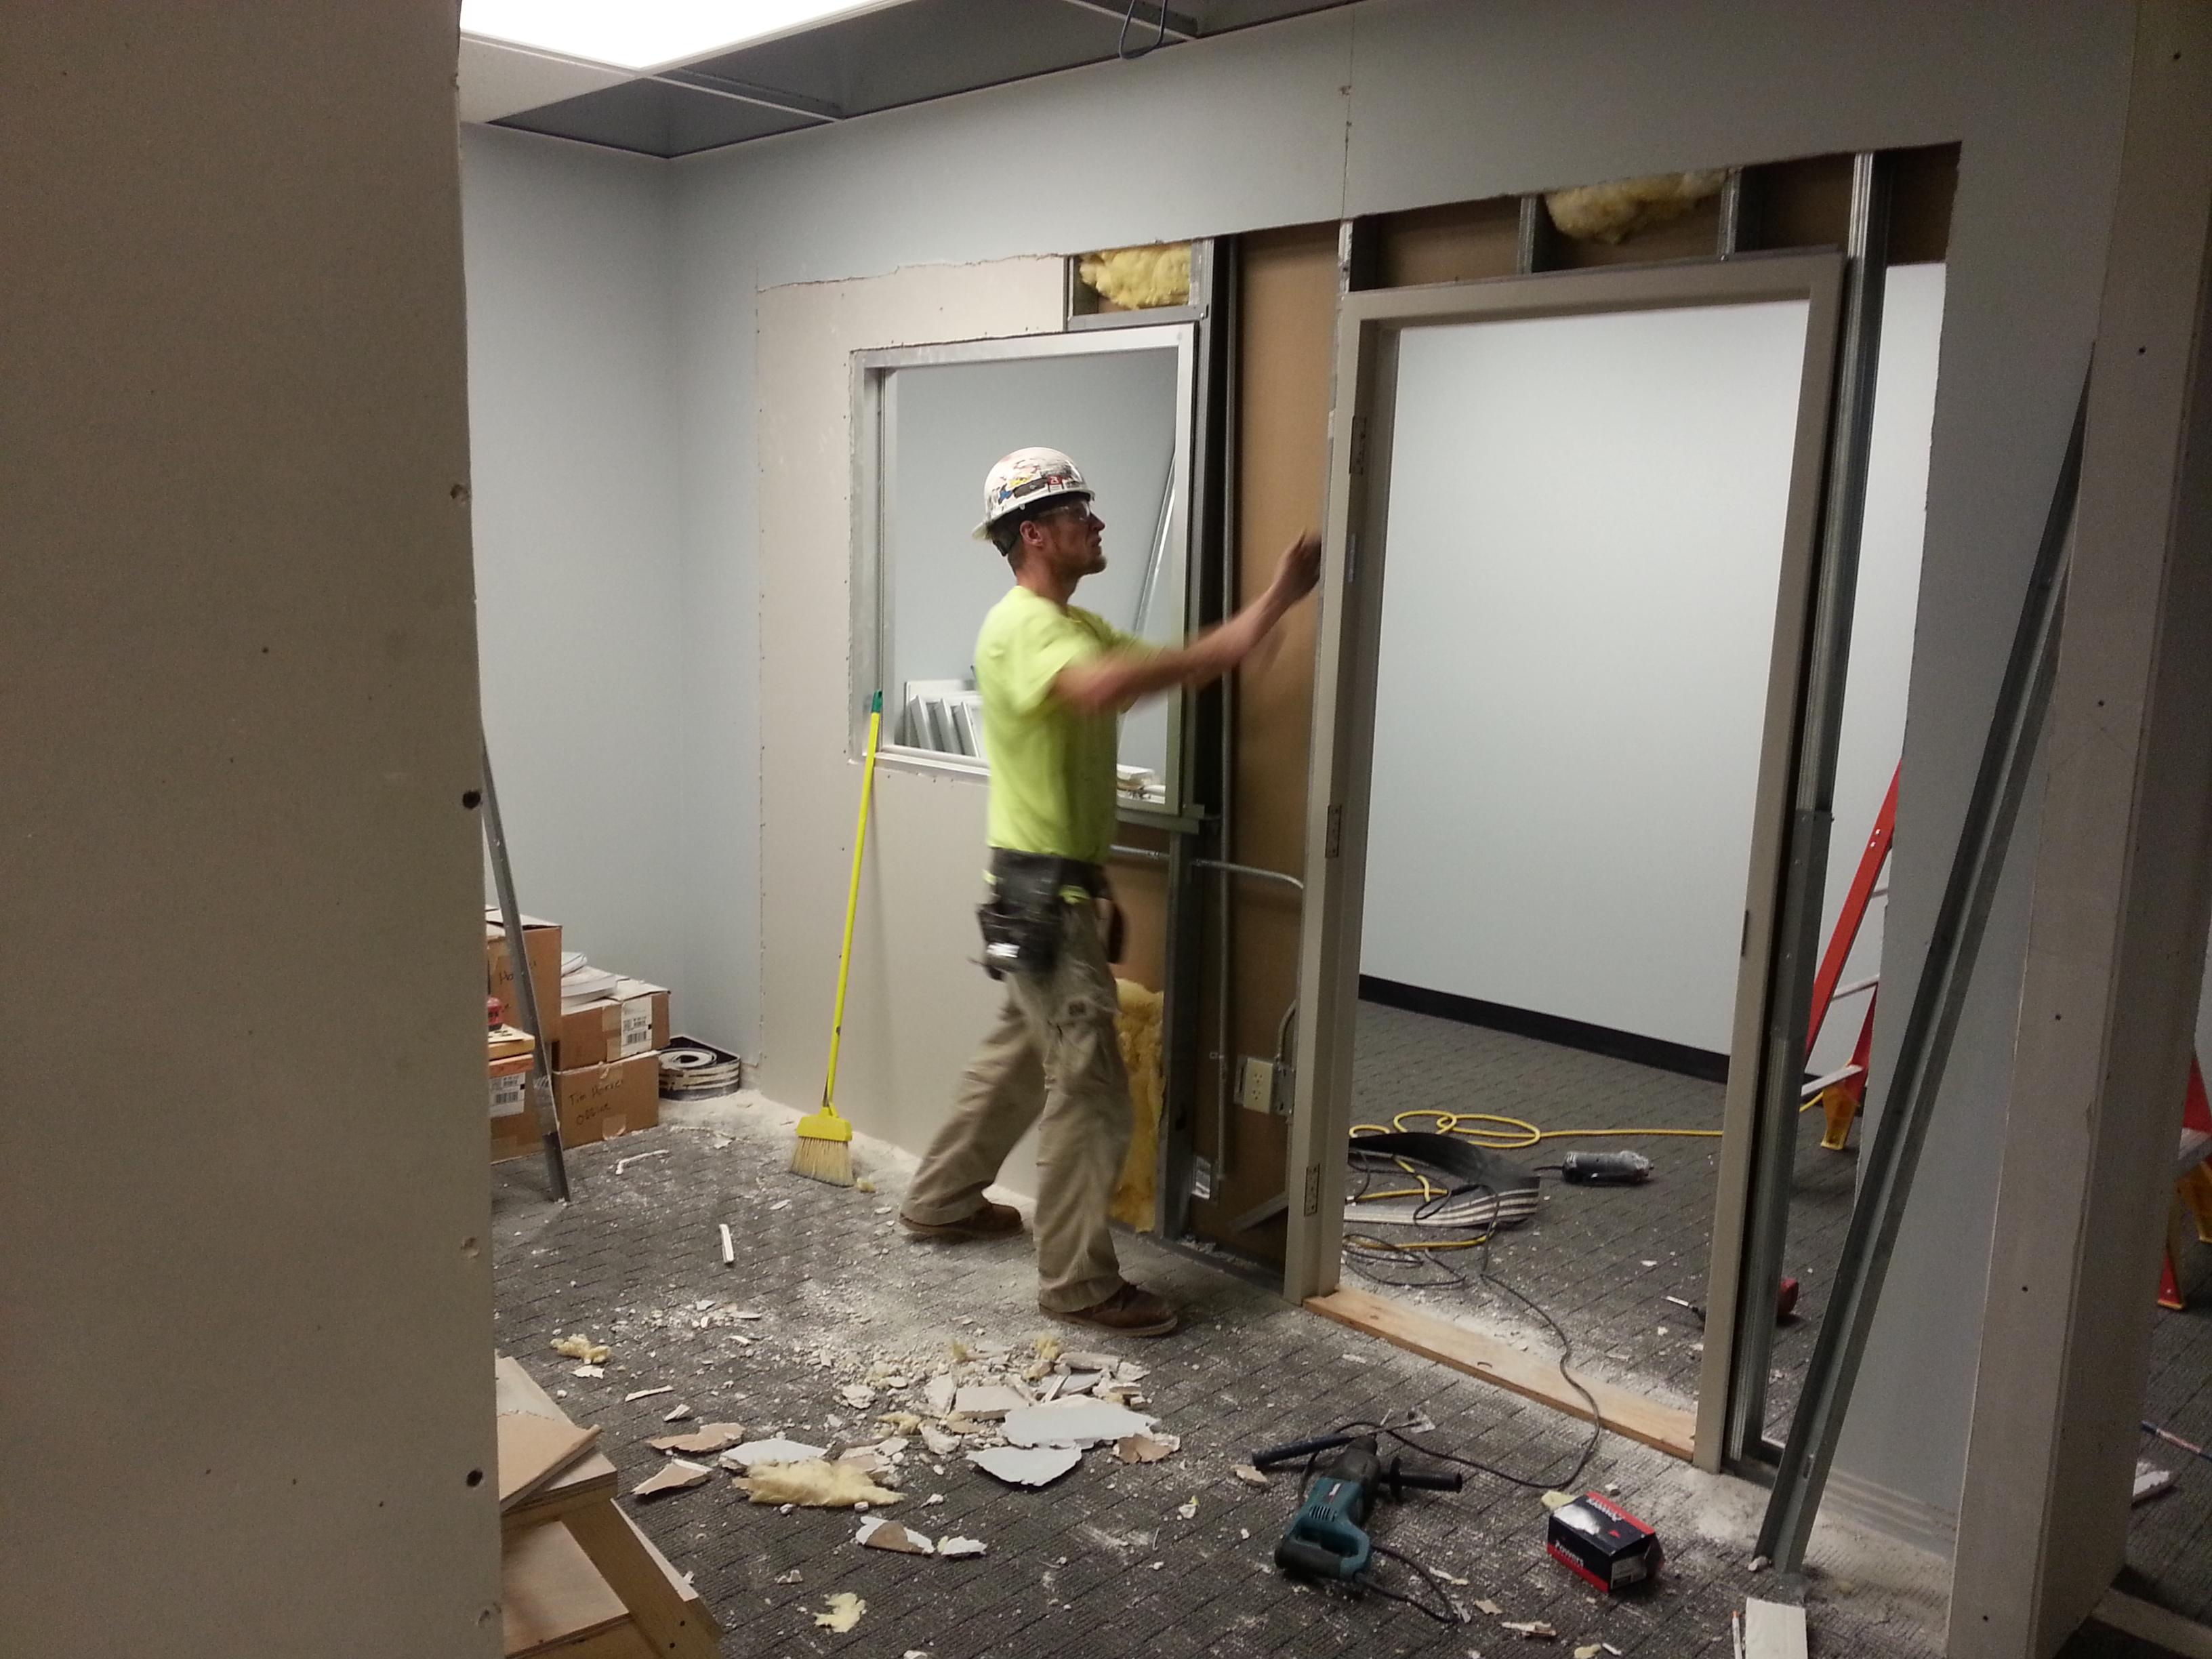 Apprentice working on ICRA room